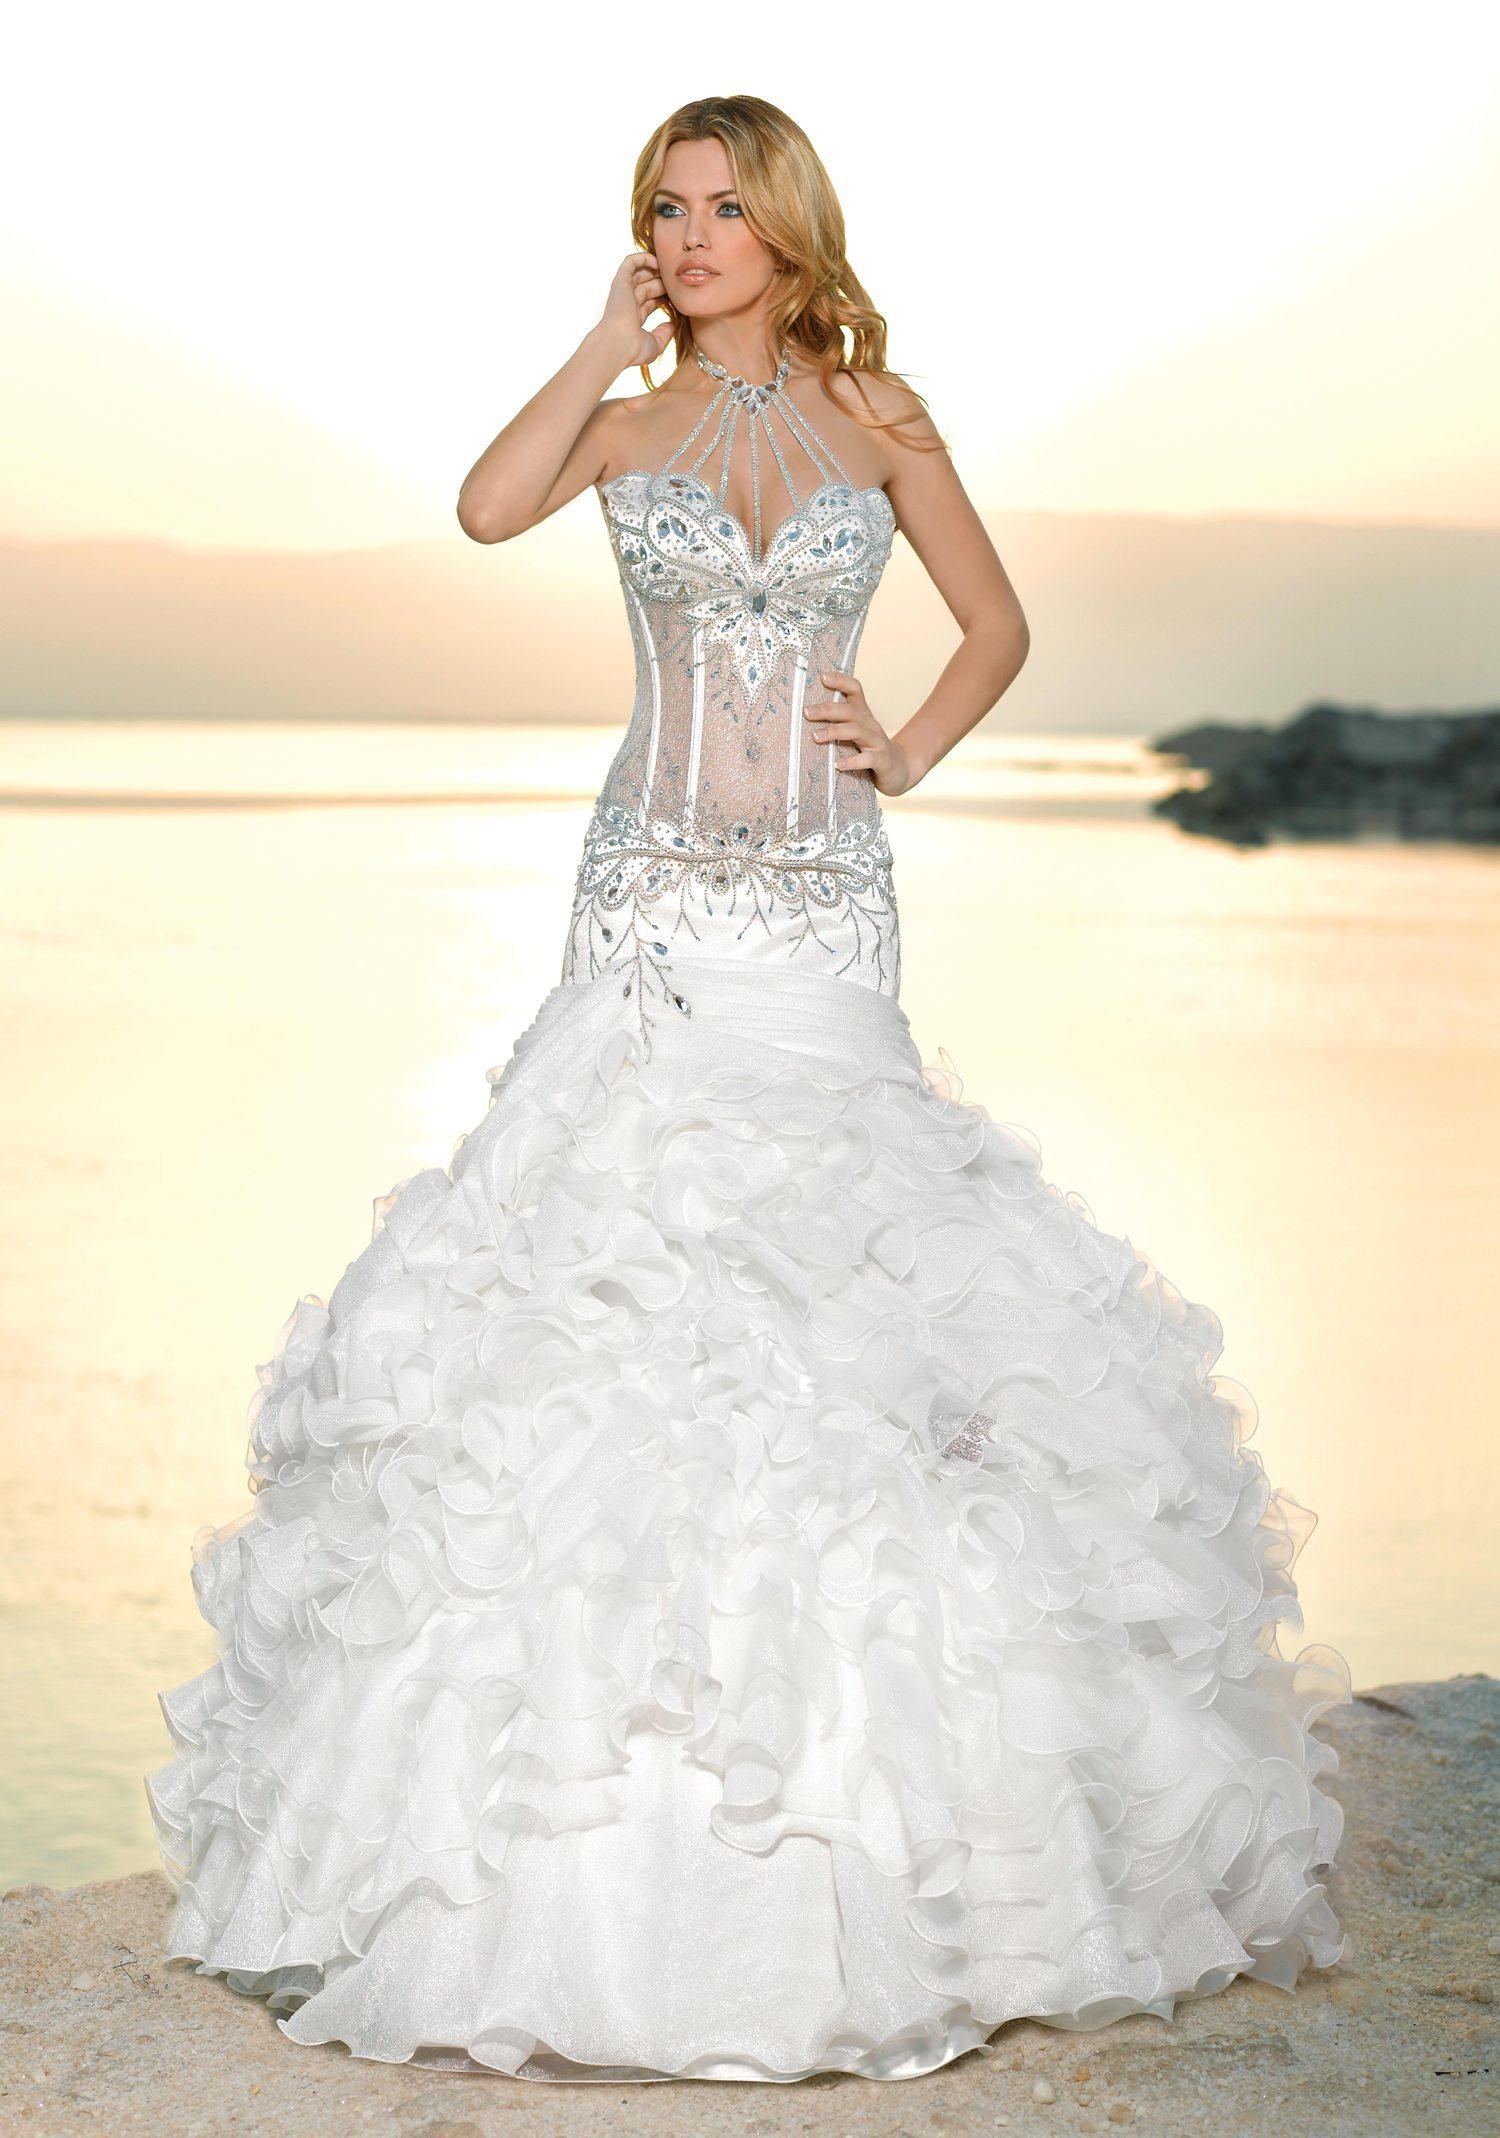 View Dress Lady May Lady May Skirt Mylady Bridal